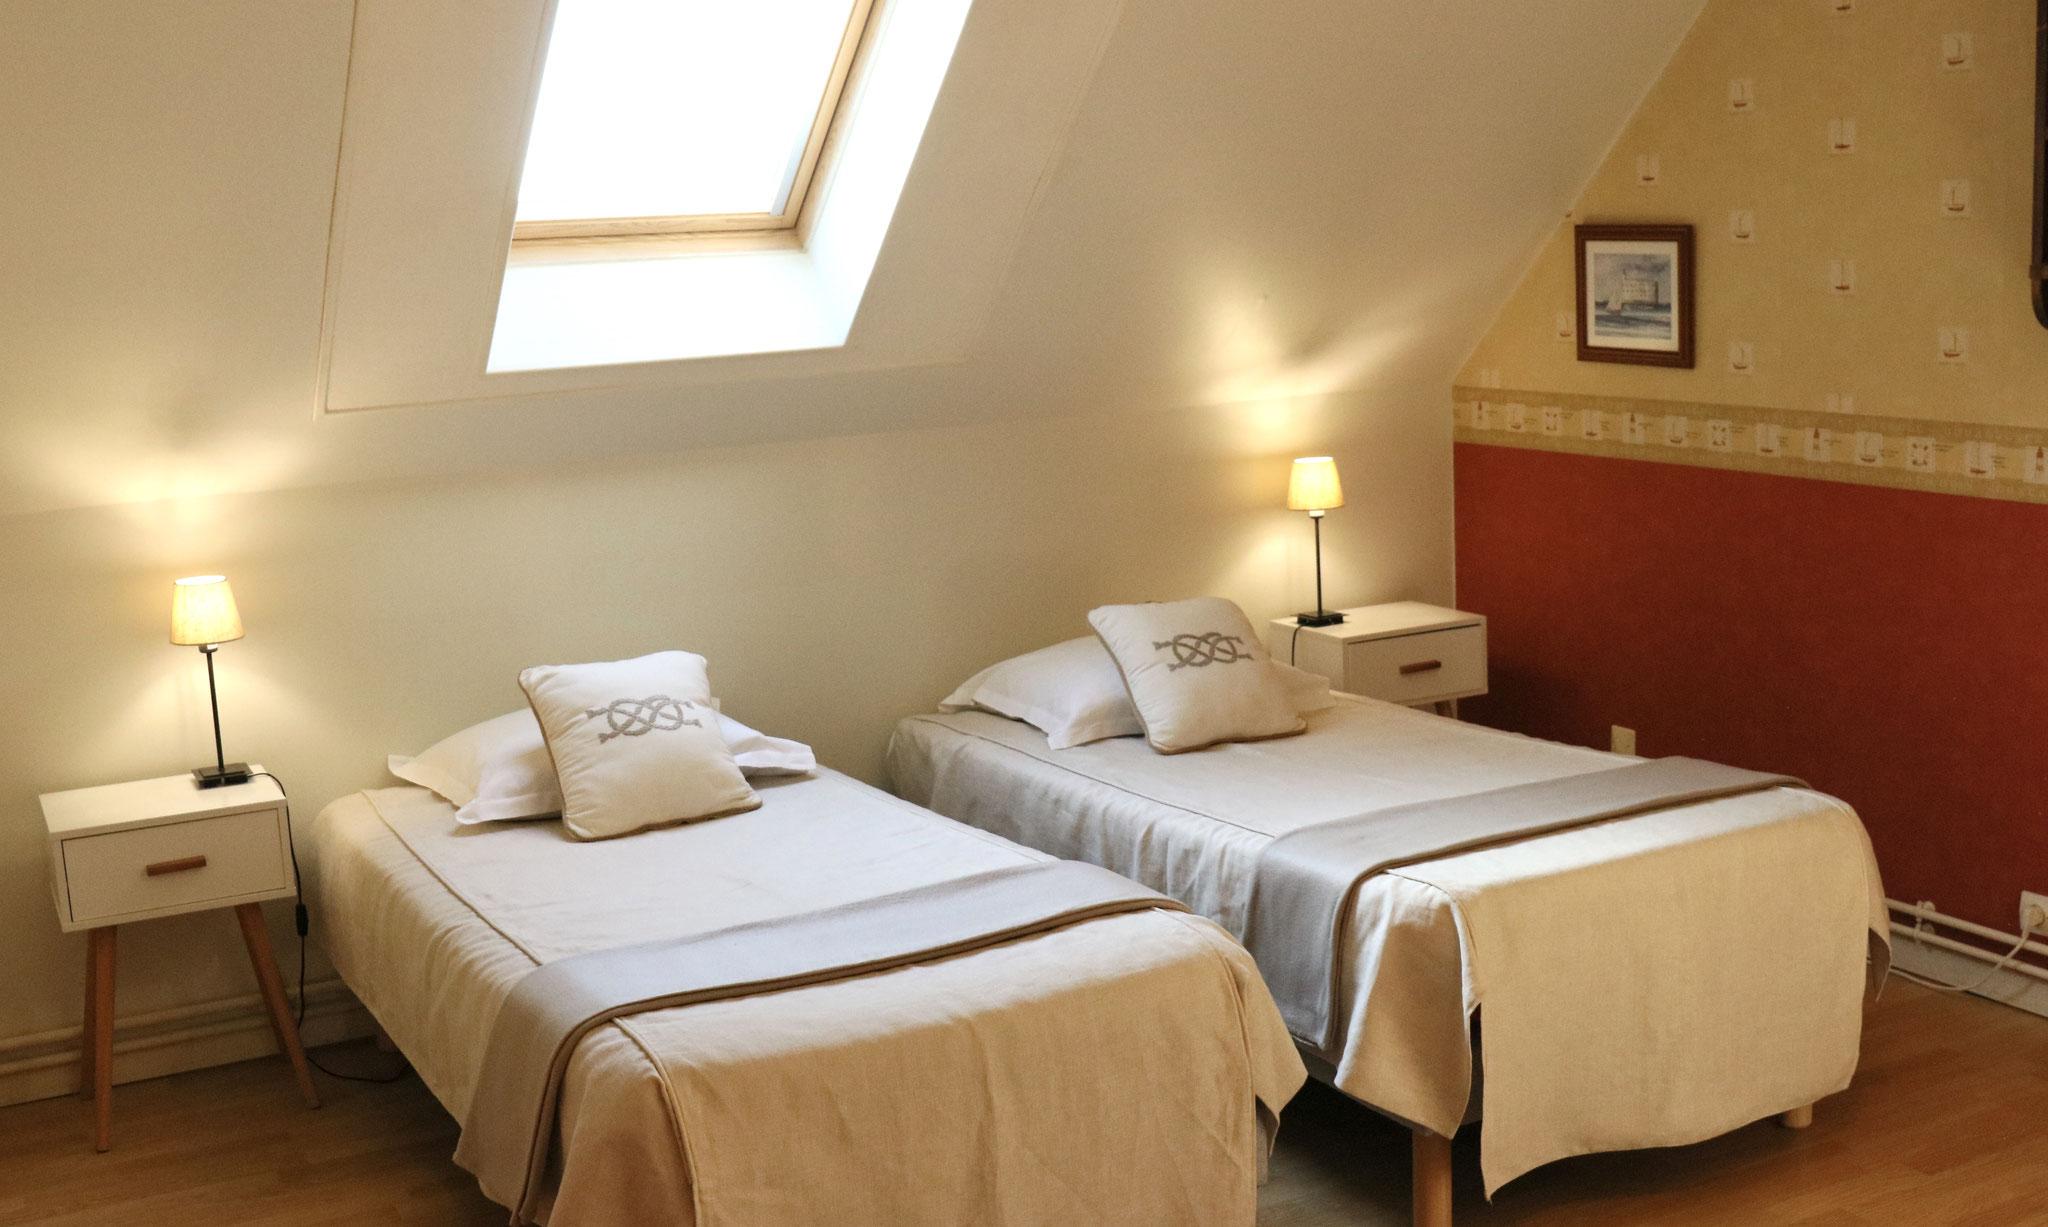 Chambre Nautique - 2 lits simples 90x190